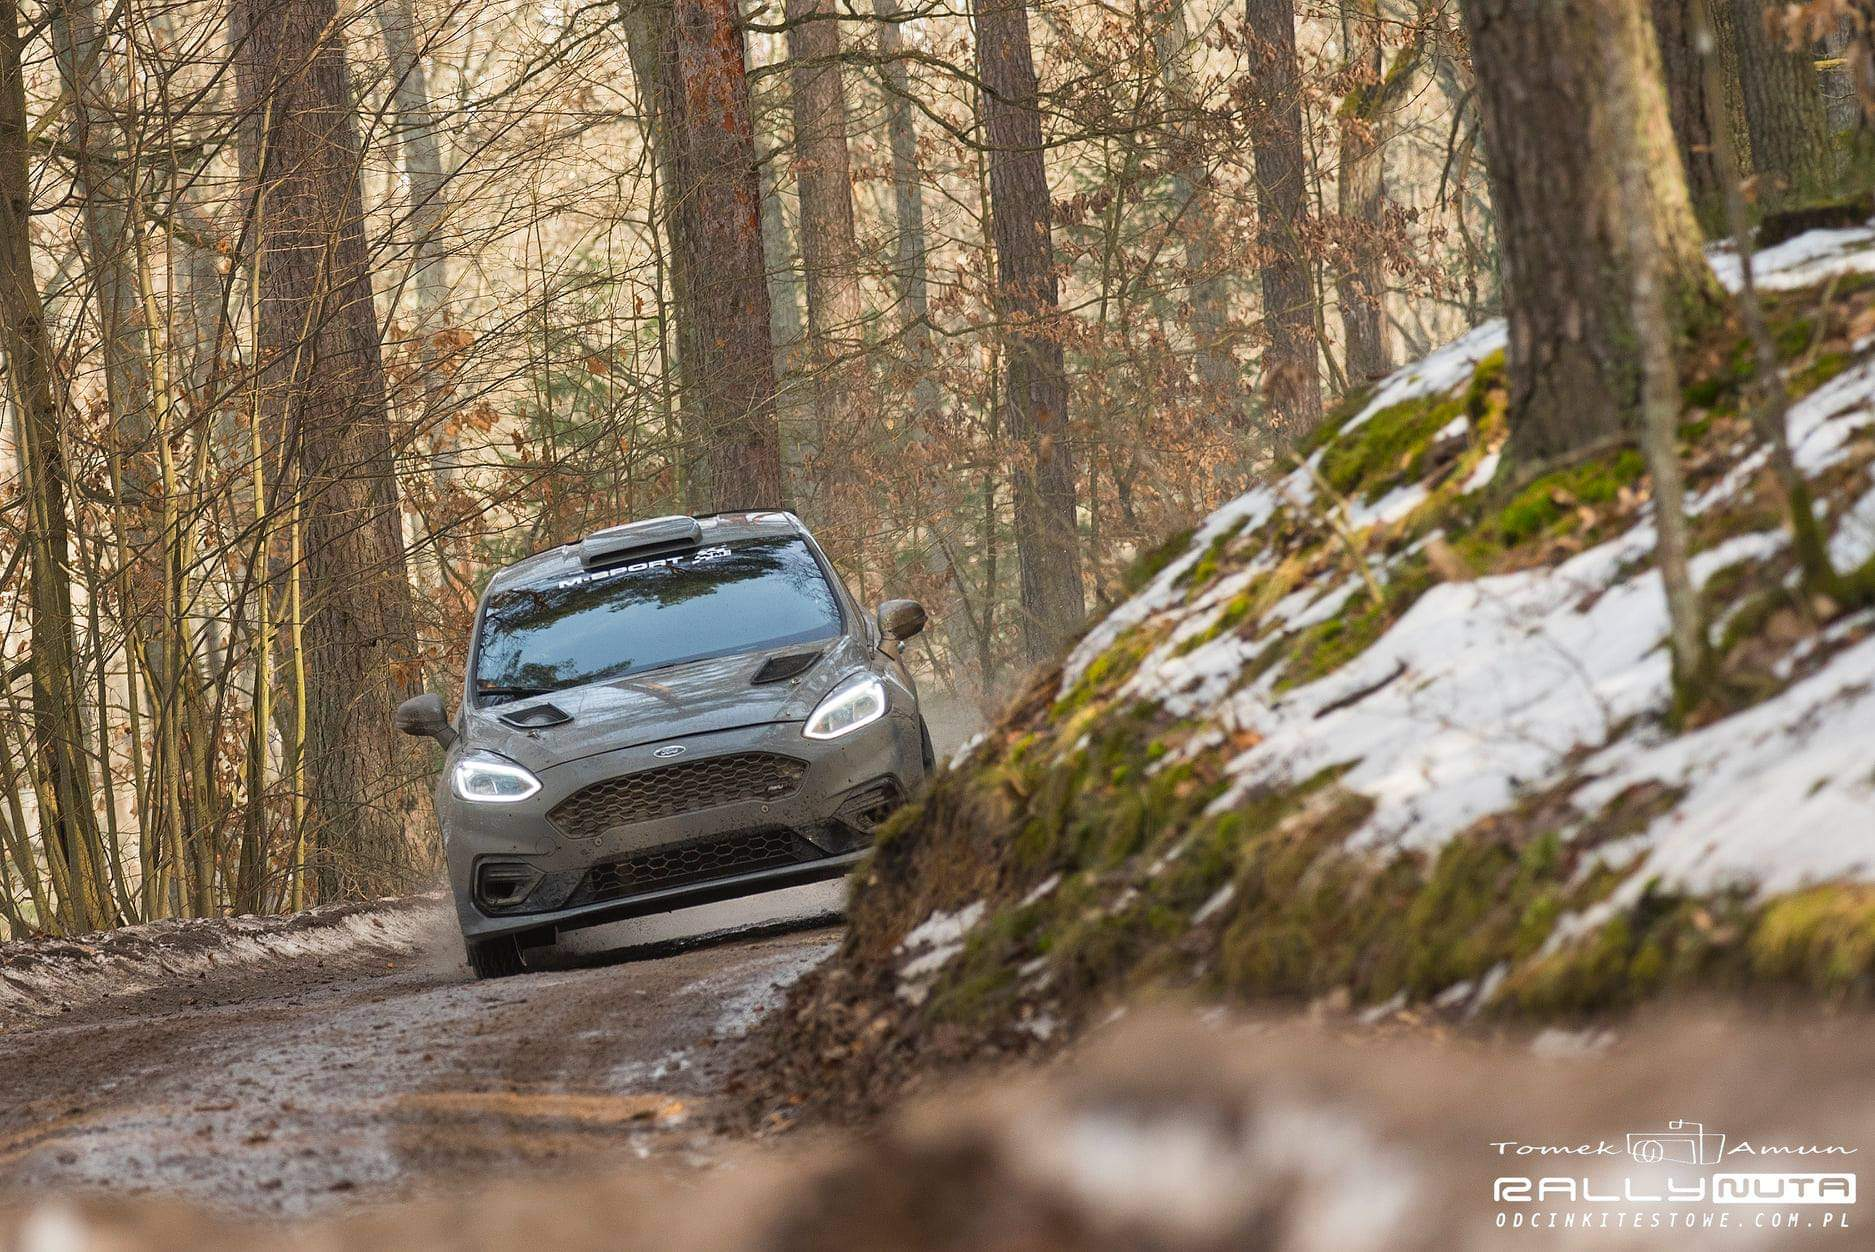 FIA European Rally Championship: Temporada 2021 - Página 3 EvBNd_CXYAgDH8v?format=jpg&name=large